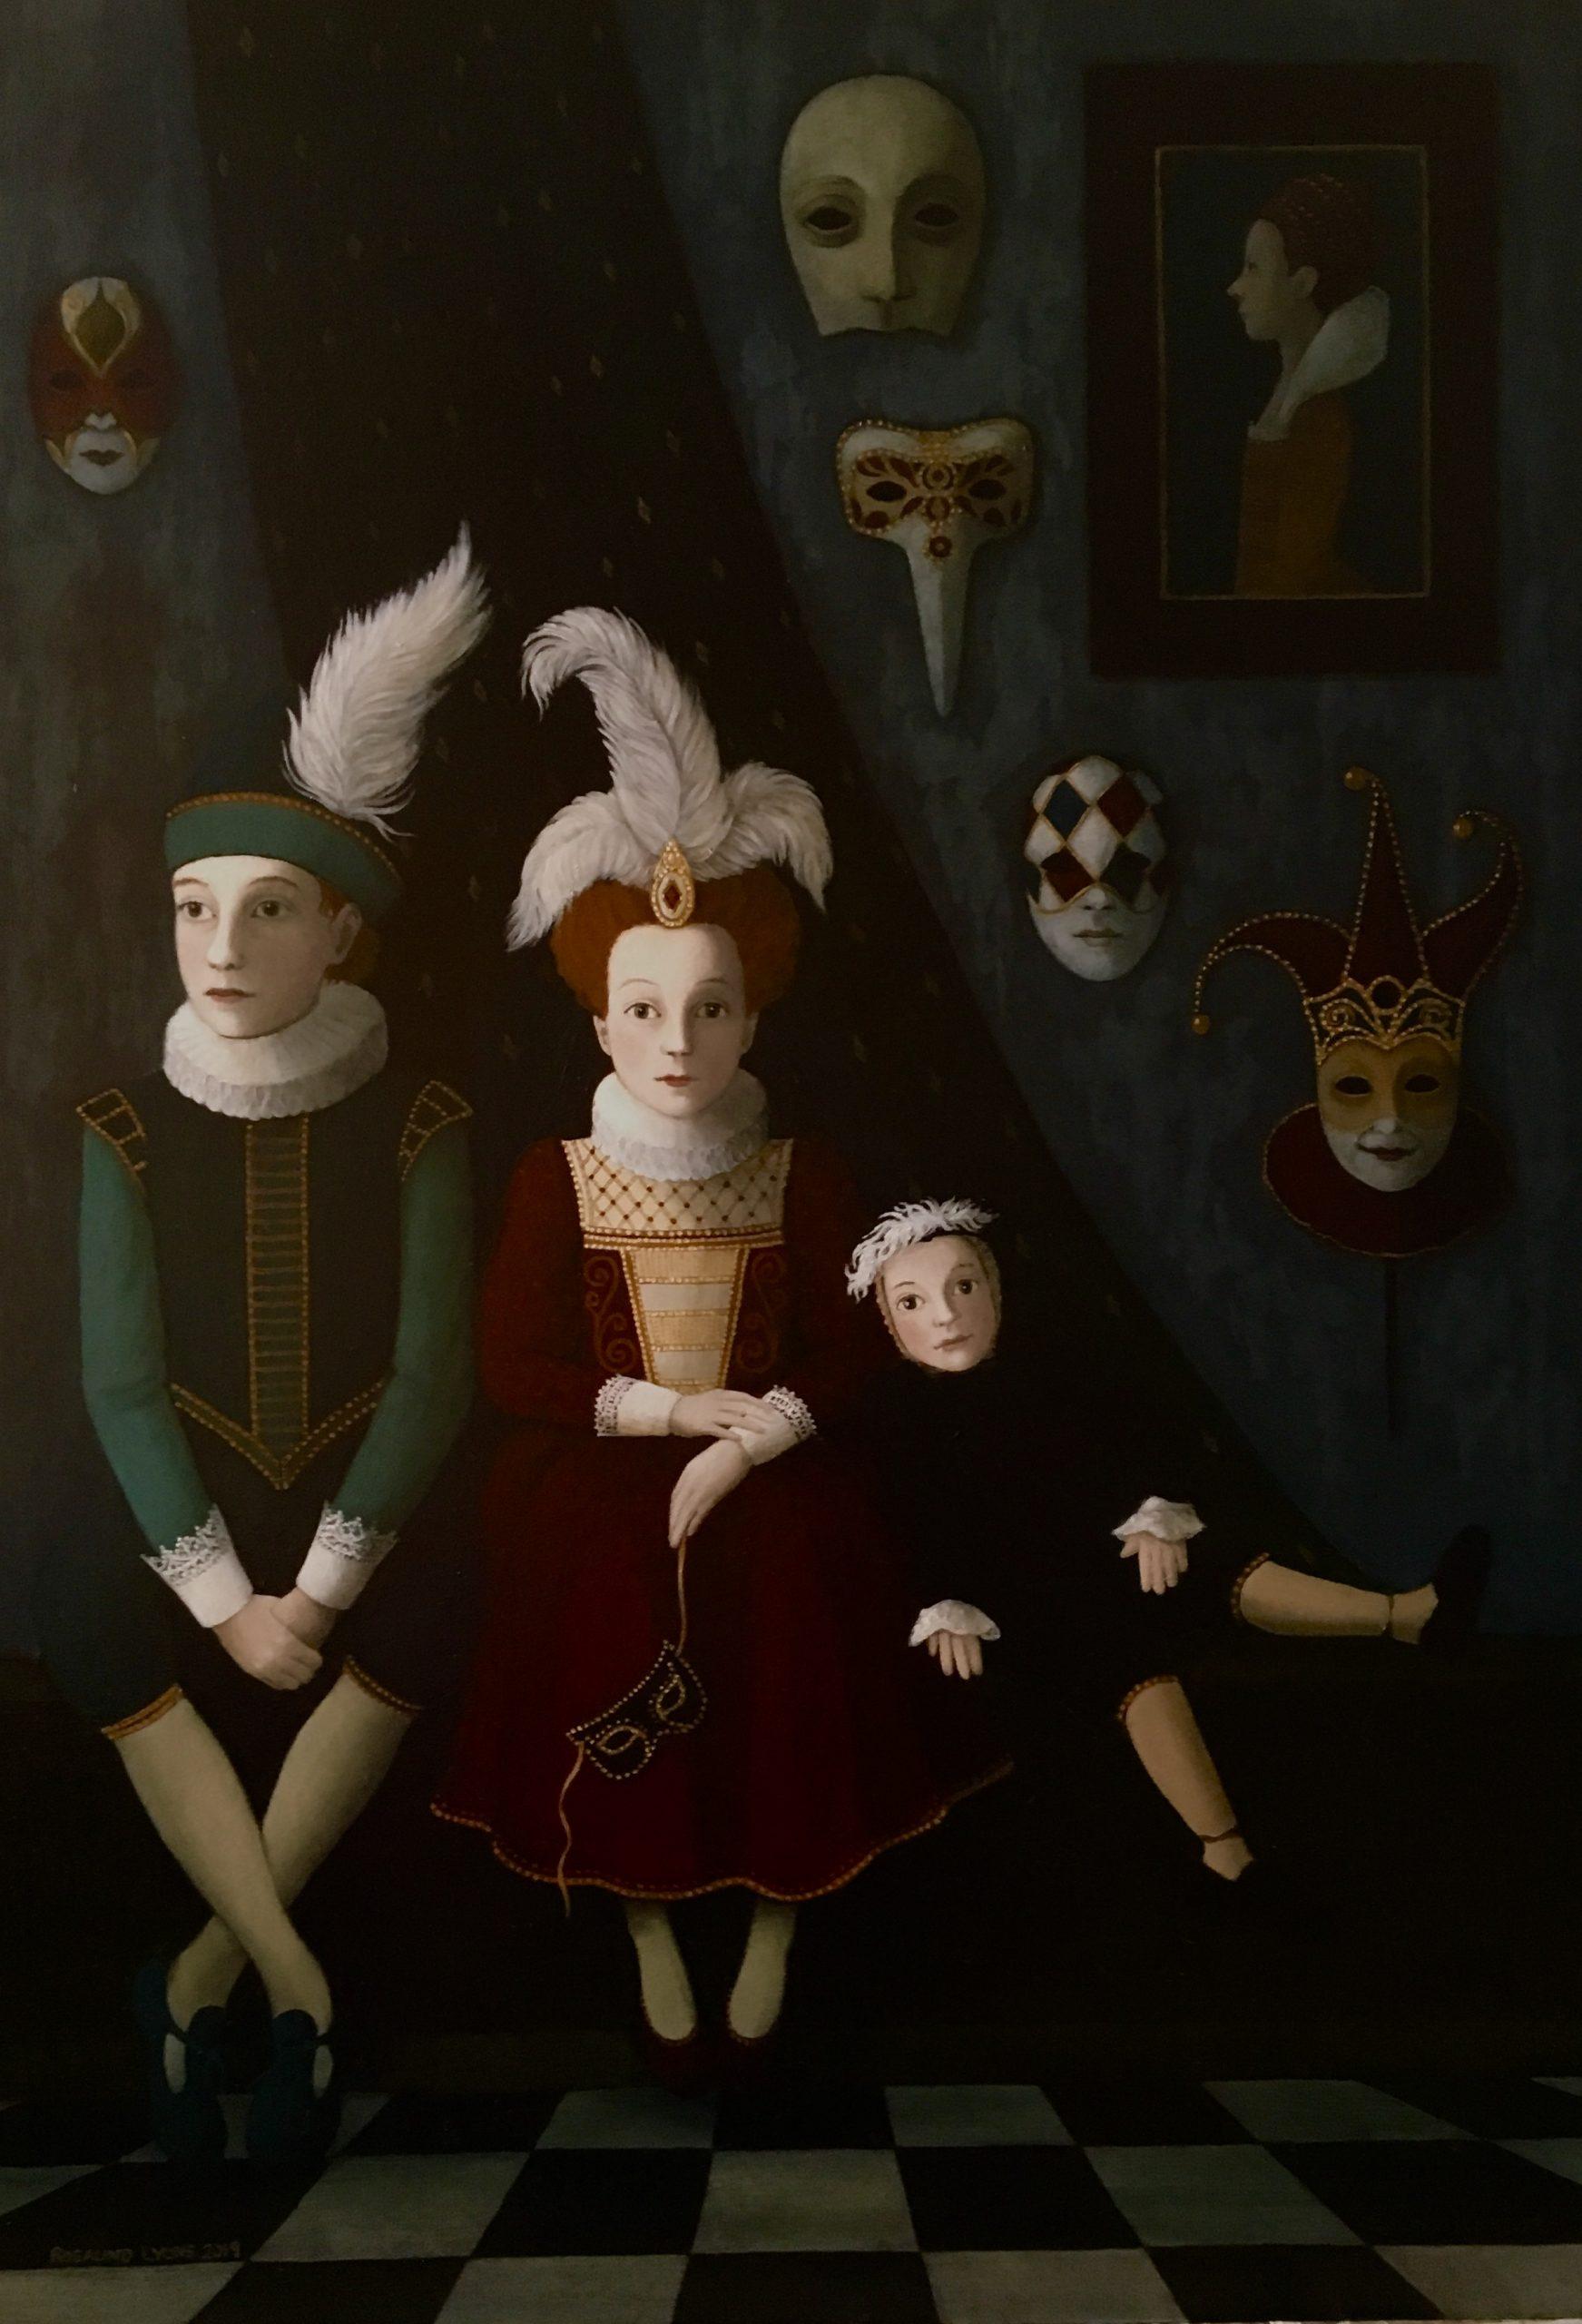 Oil on Board - Rosalind Lyons Original Painting